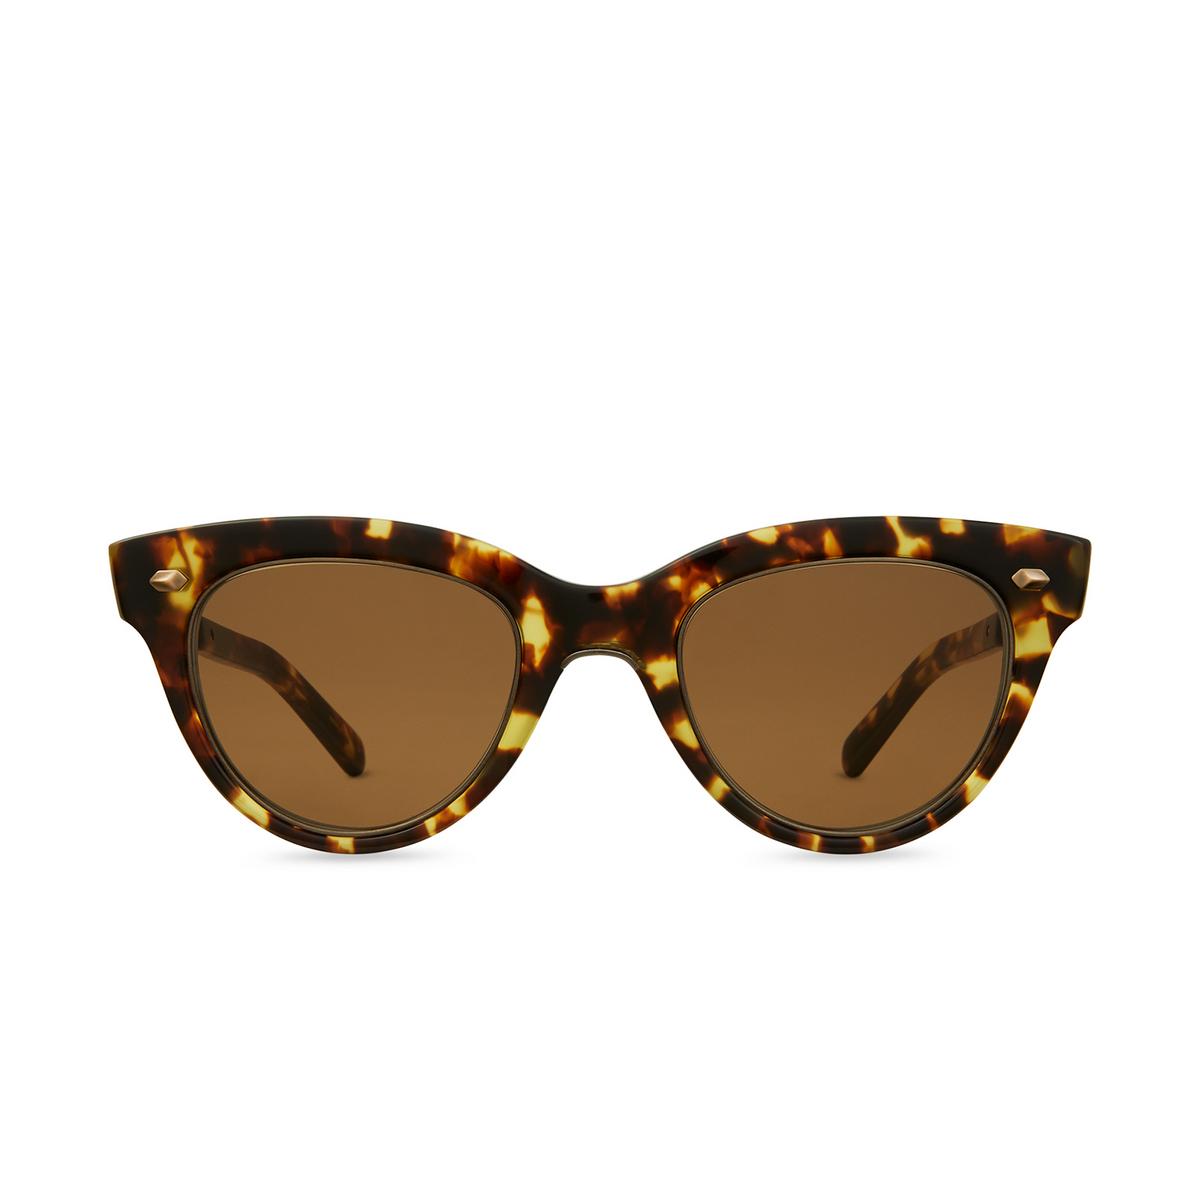 Mr. Leight® Cat-eye Sunglasses: Madison S color Trt-atg/sfbrn.